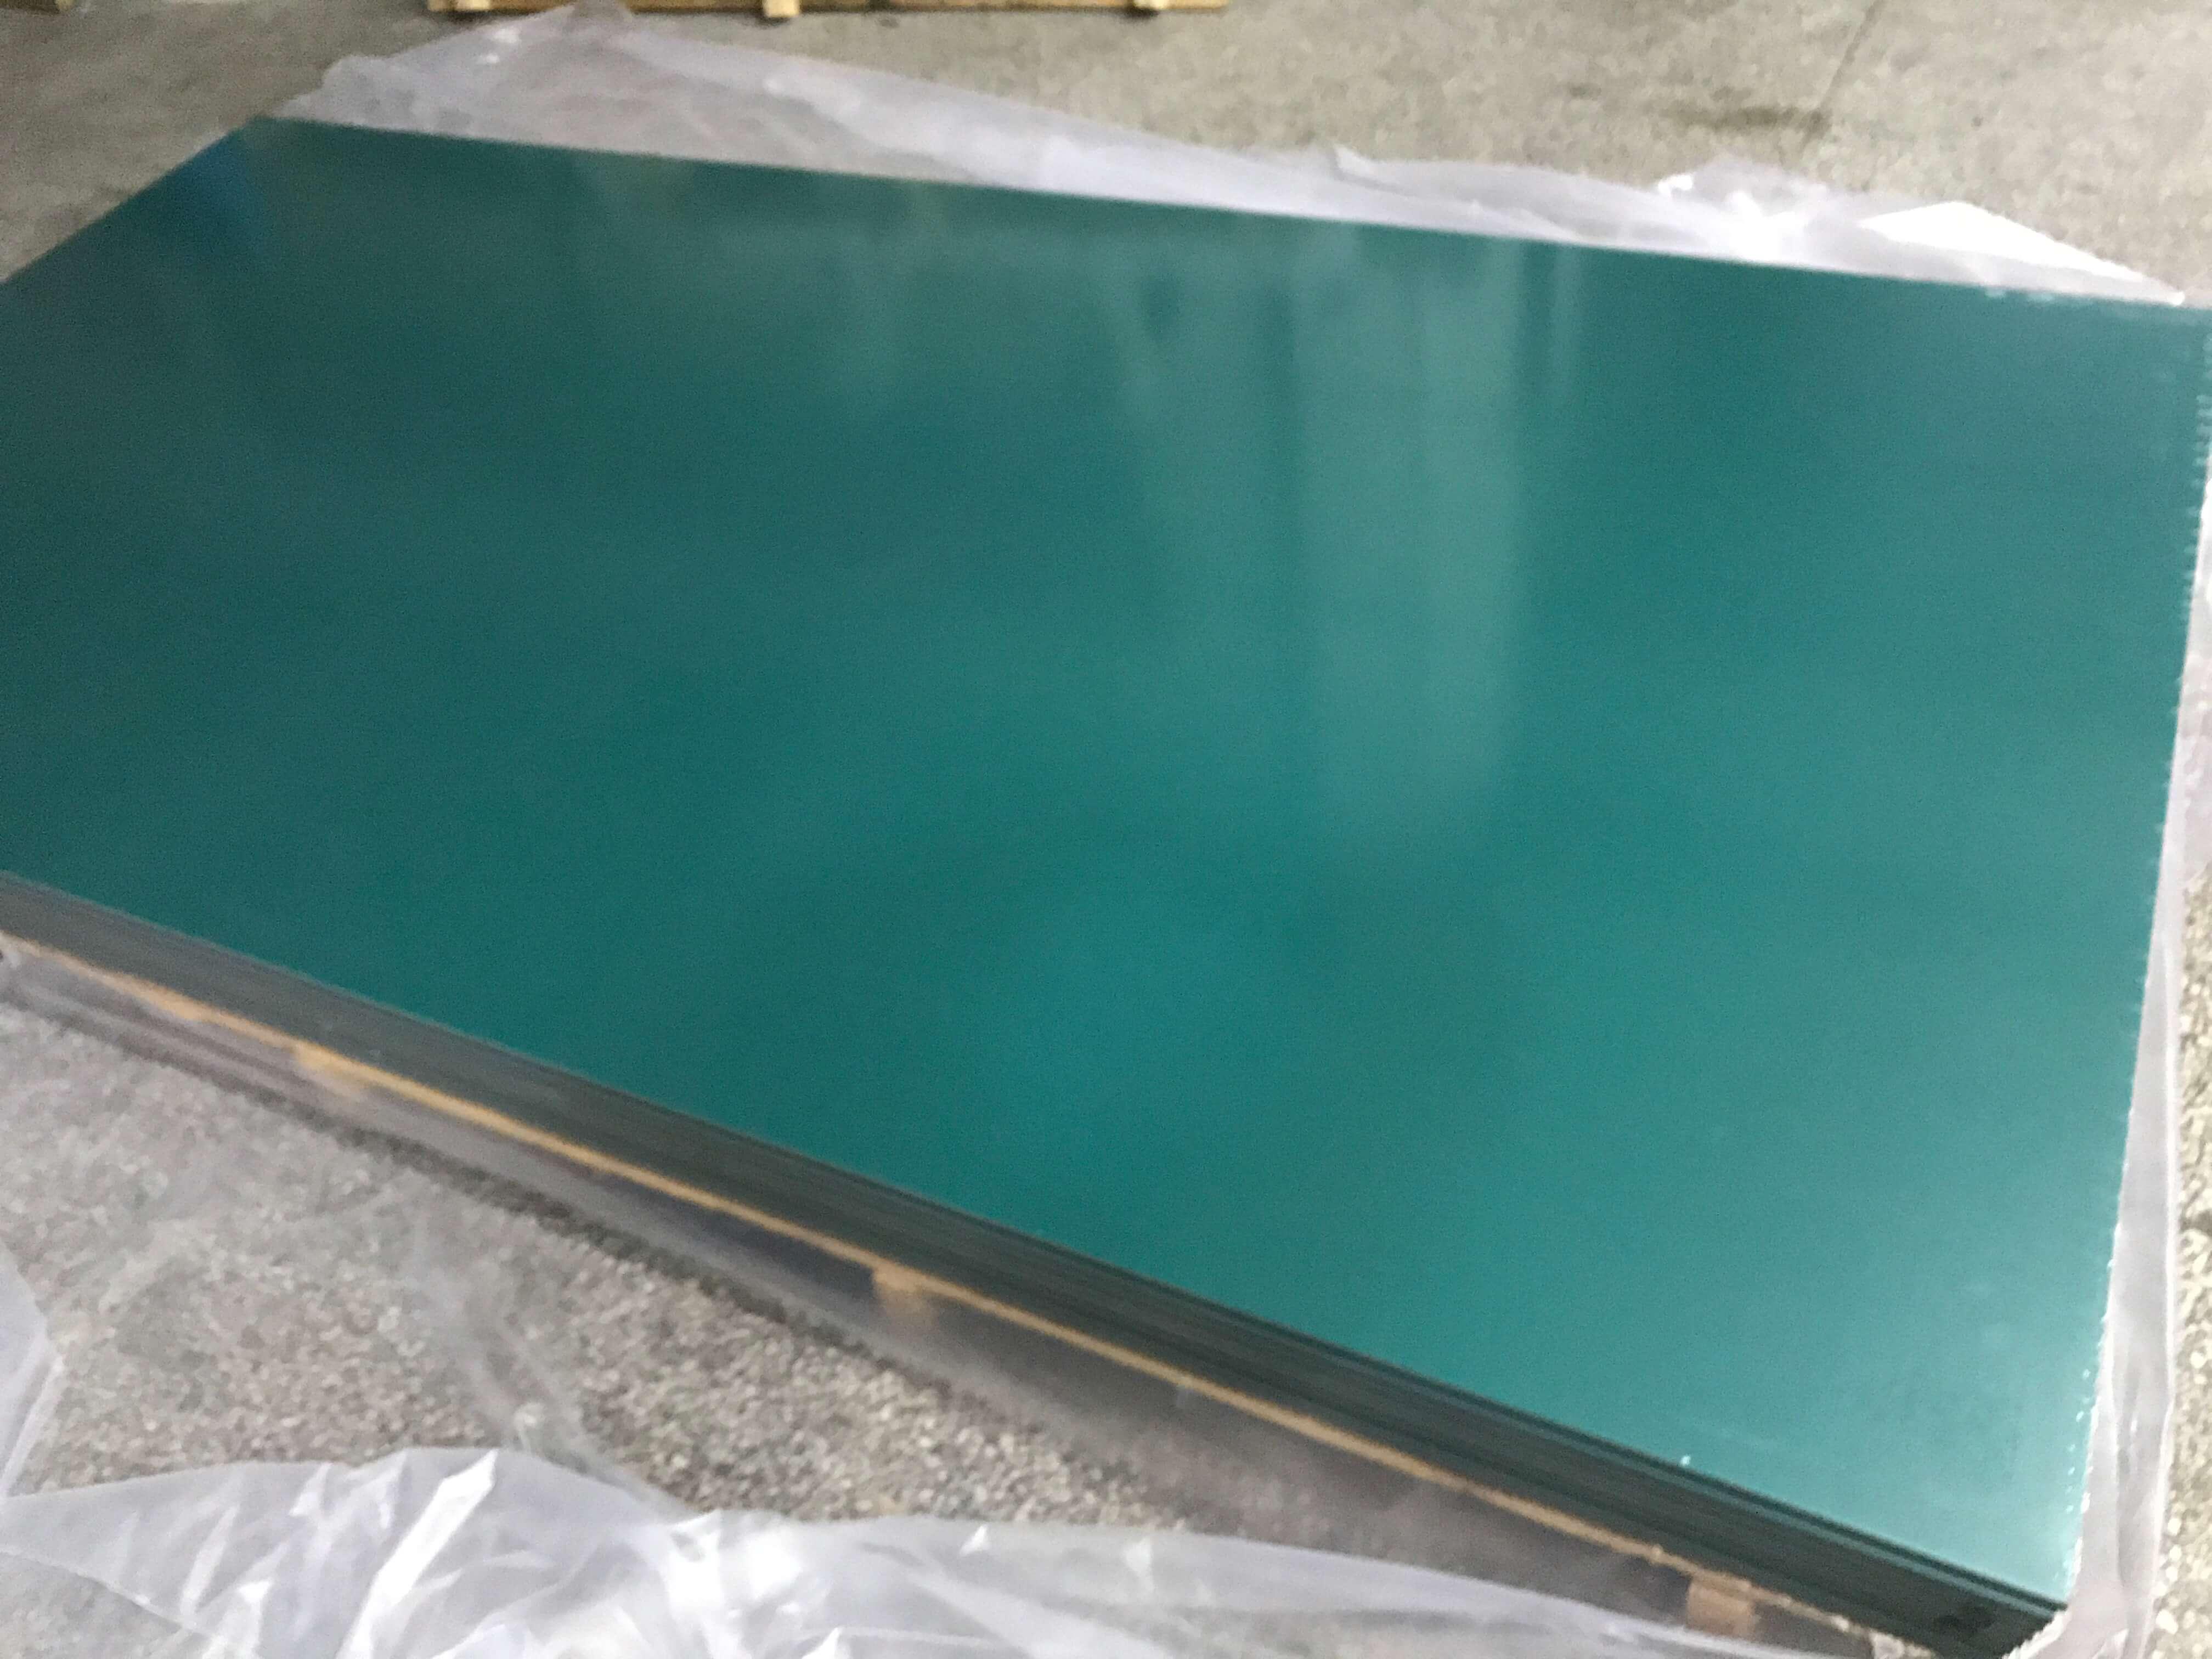 chemical table top.JPG